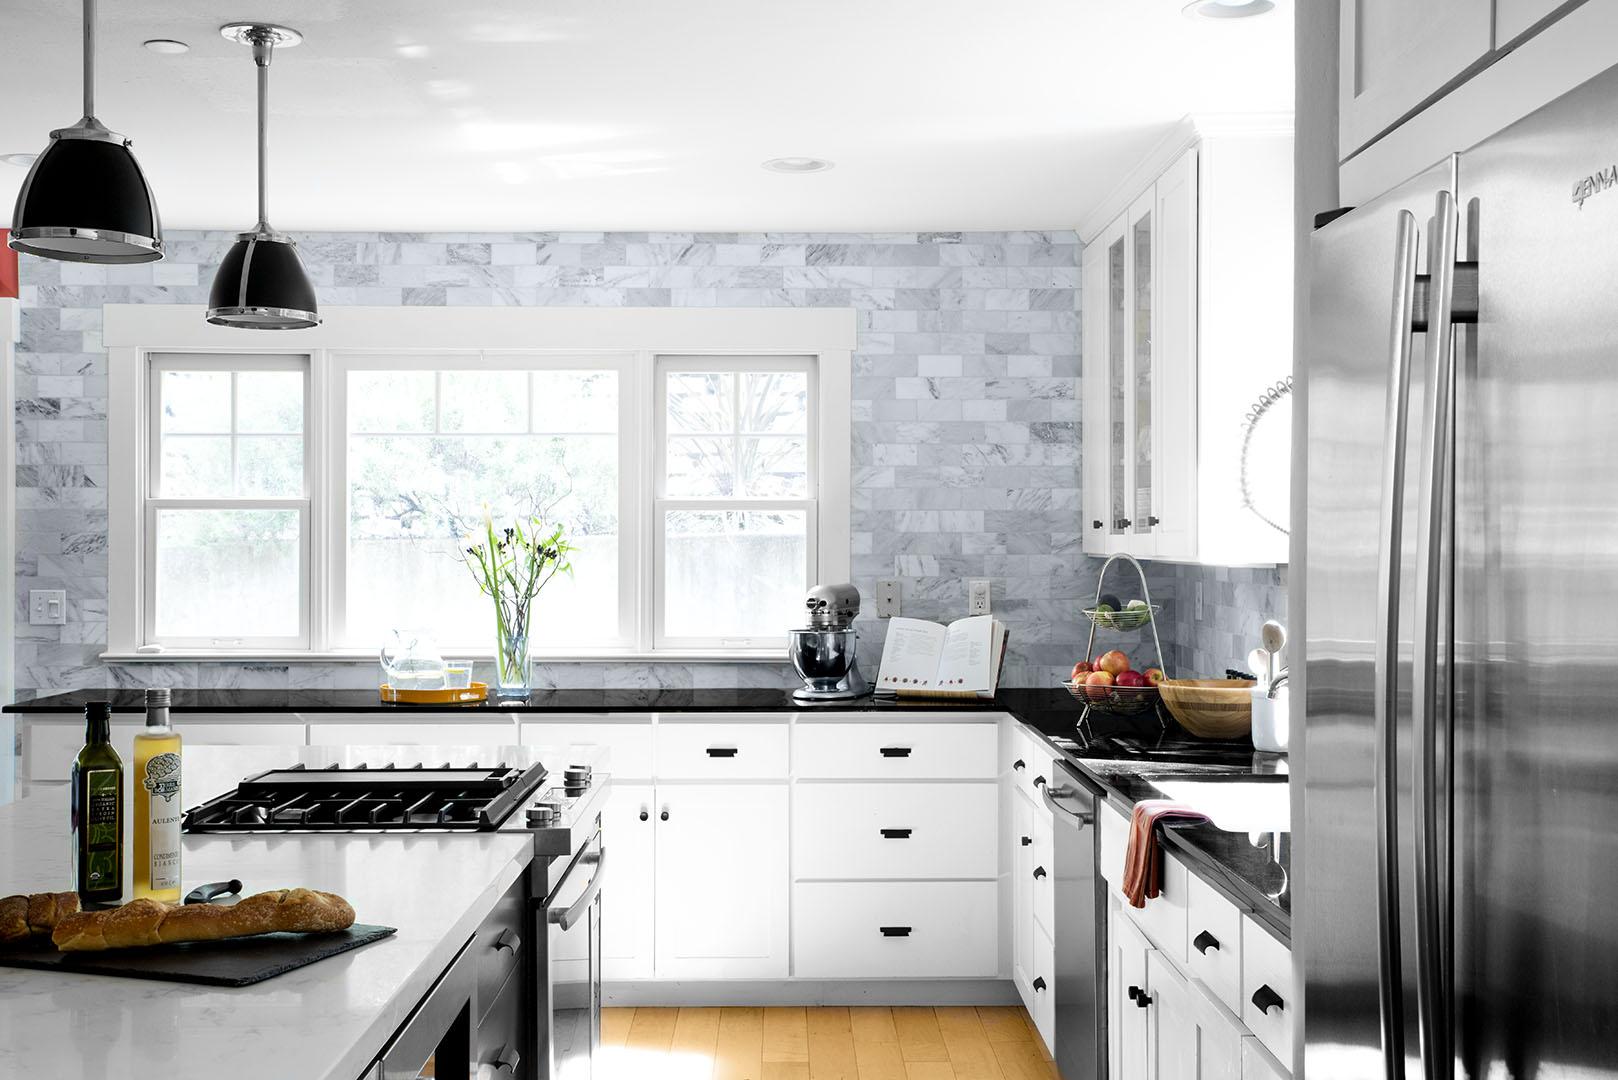 Kitchen remodel in Oakland, CA